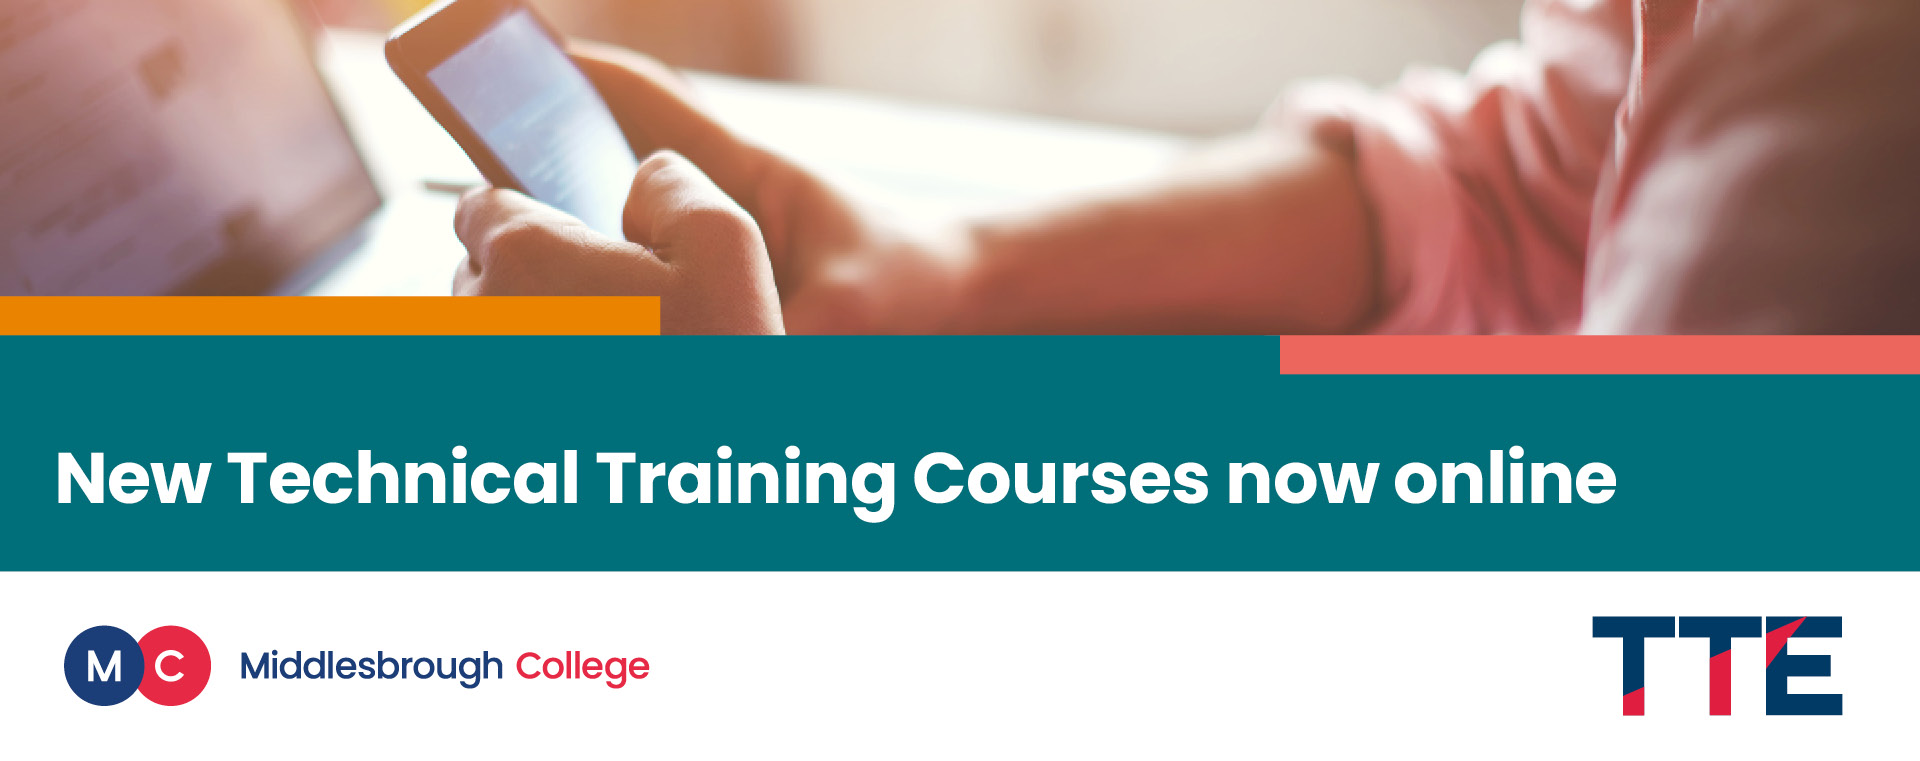 New Technical Training Courses_Desktop